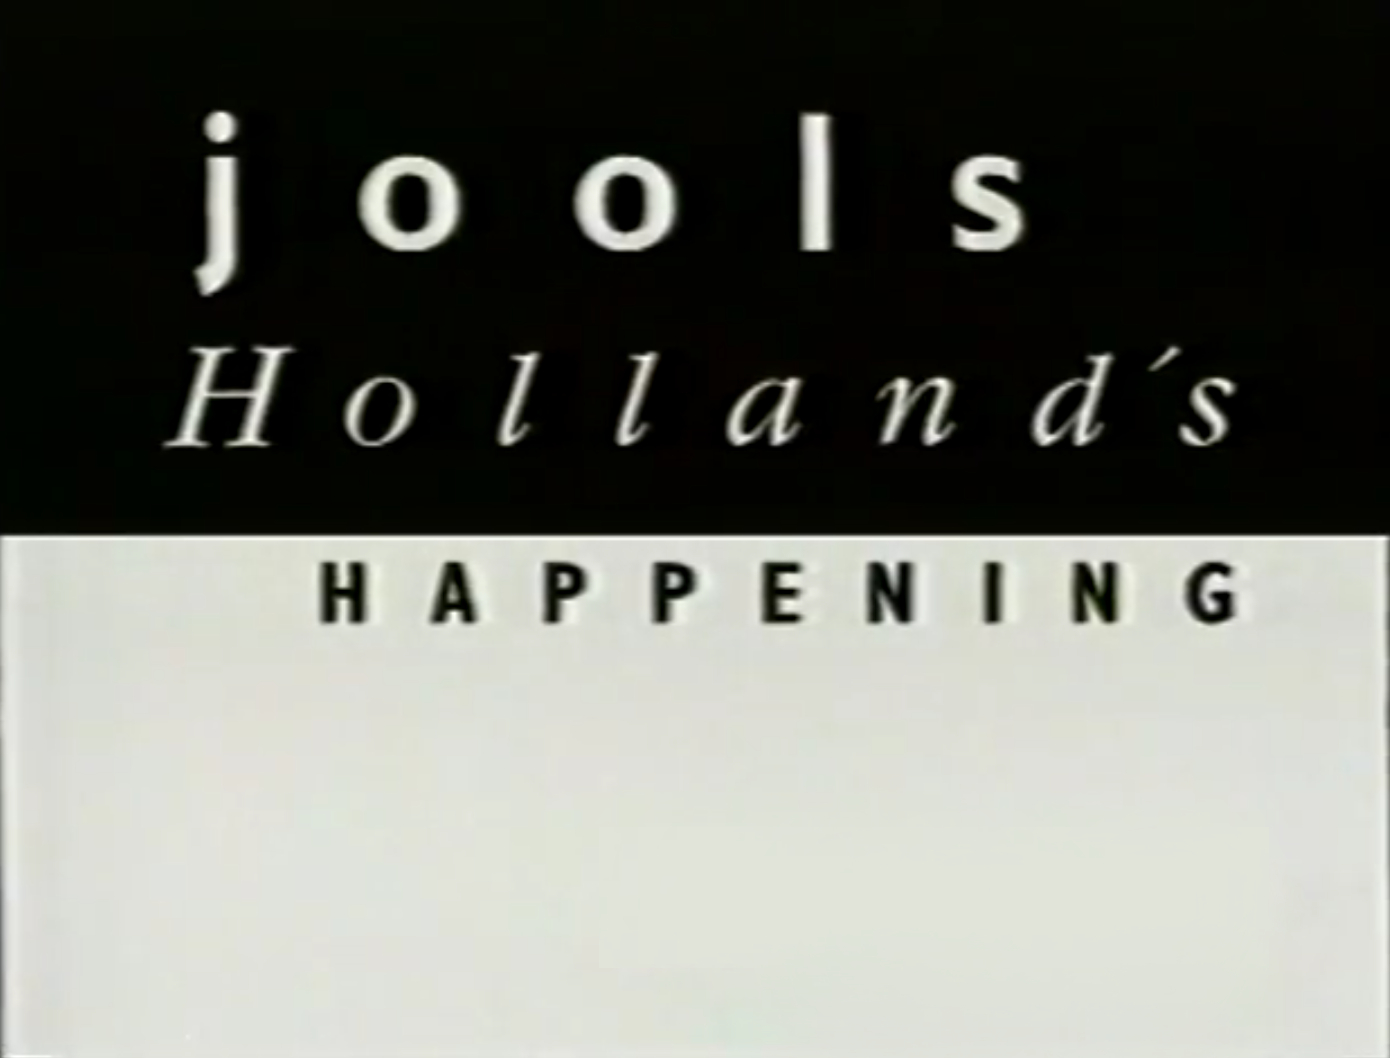 Jools Holland's Happening